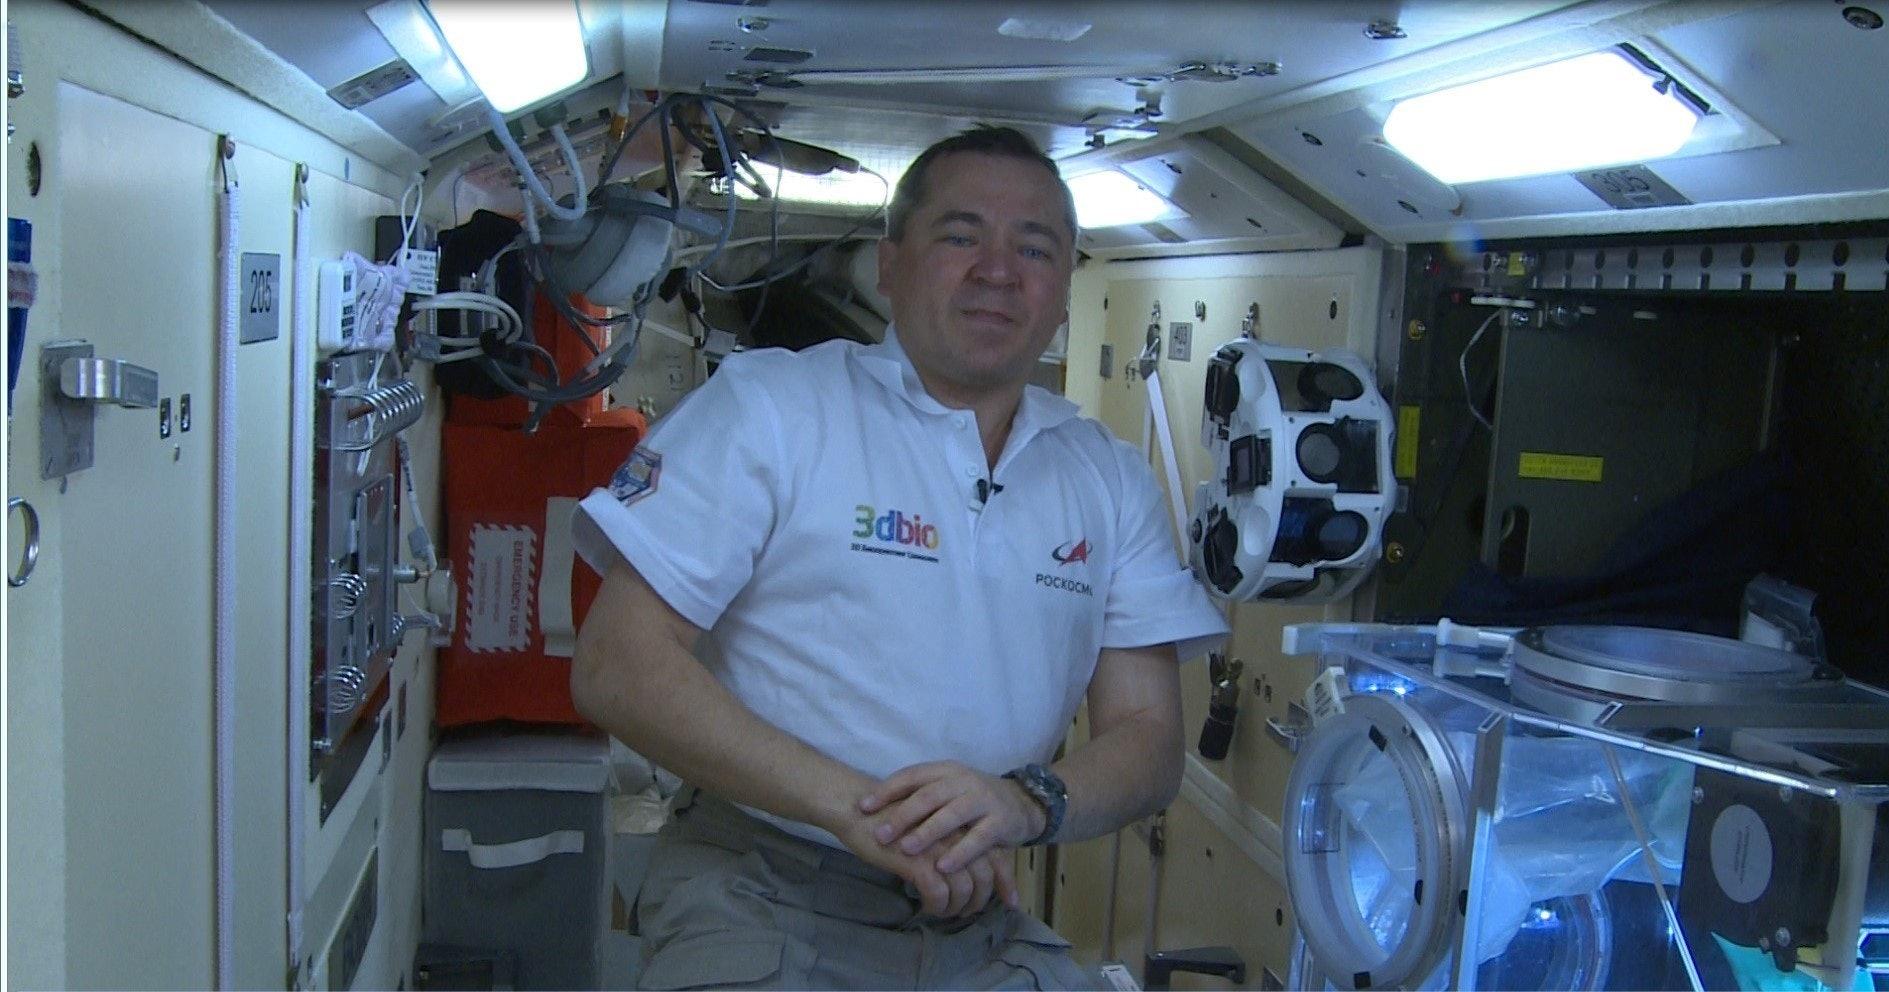 Oleg Skripochka conducting the experiment on the ISS.